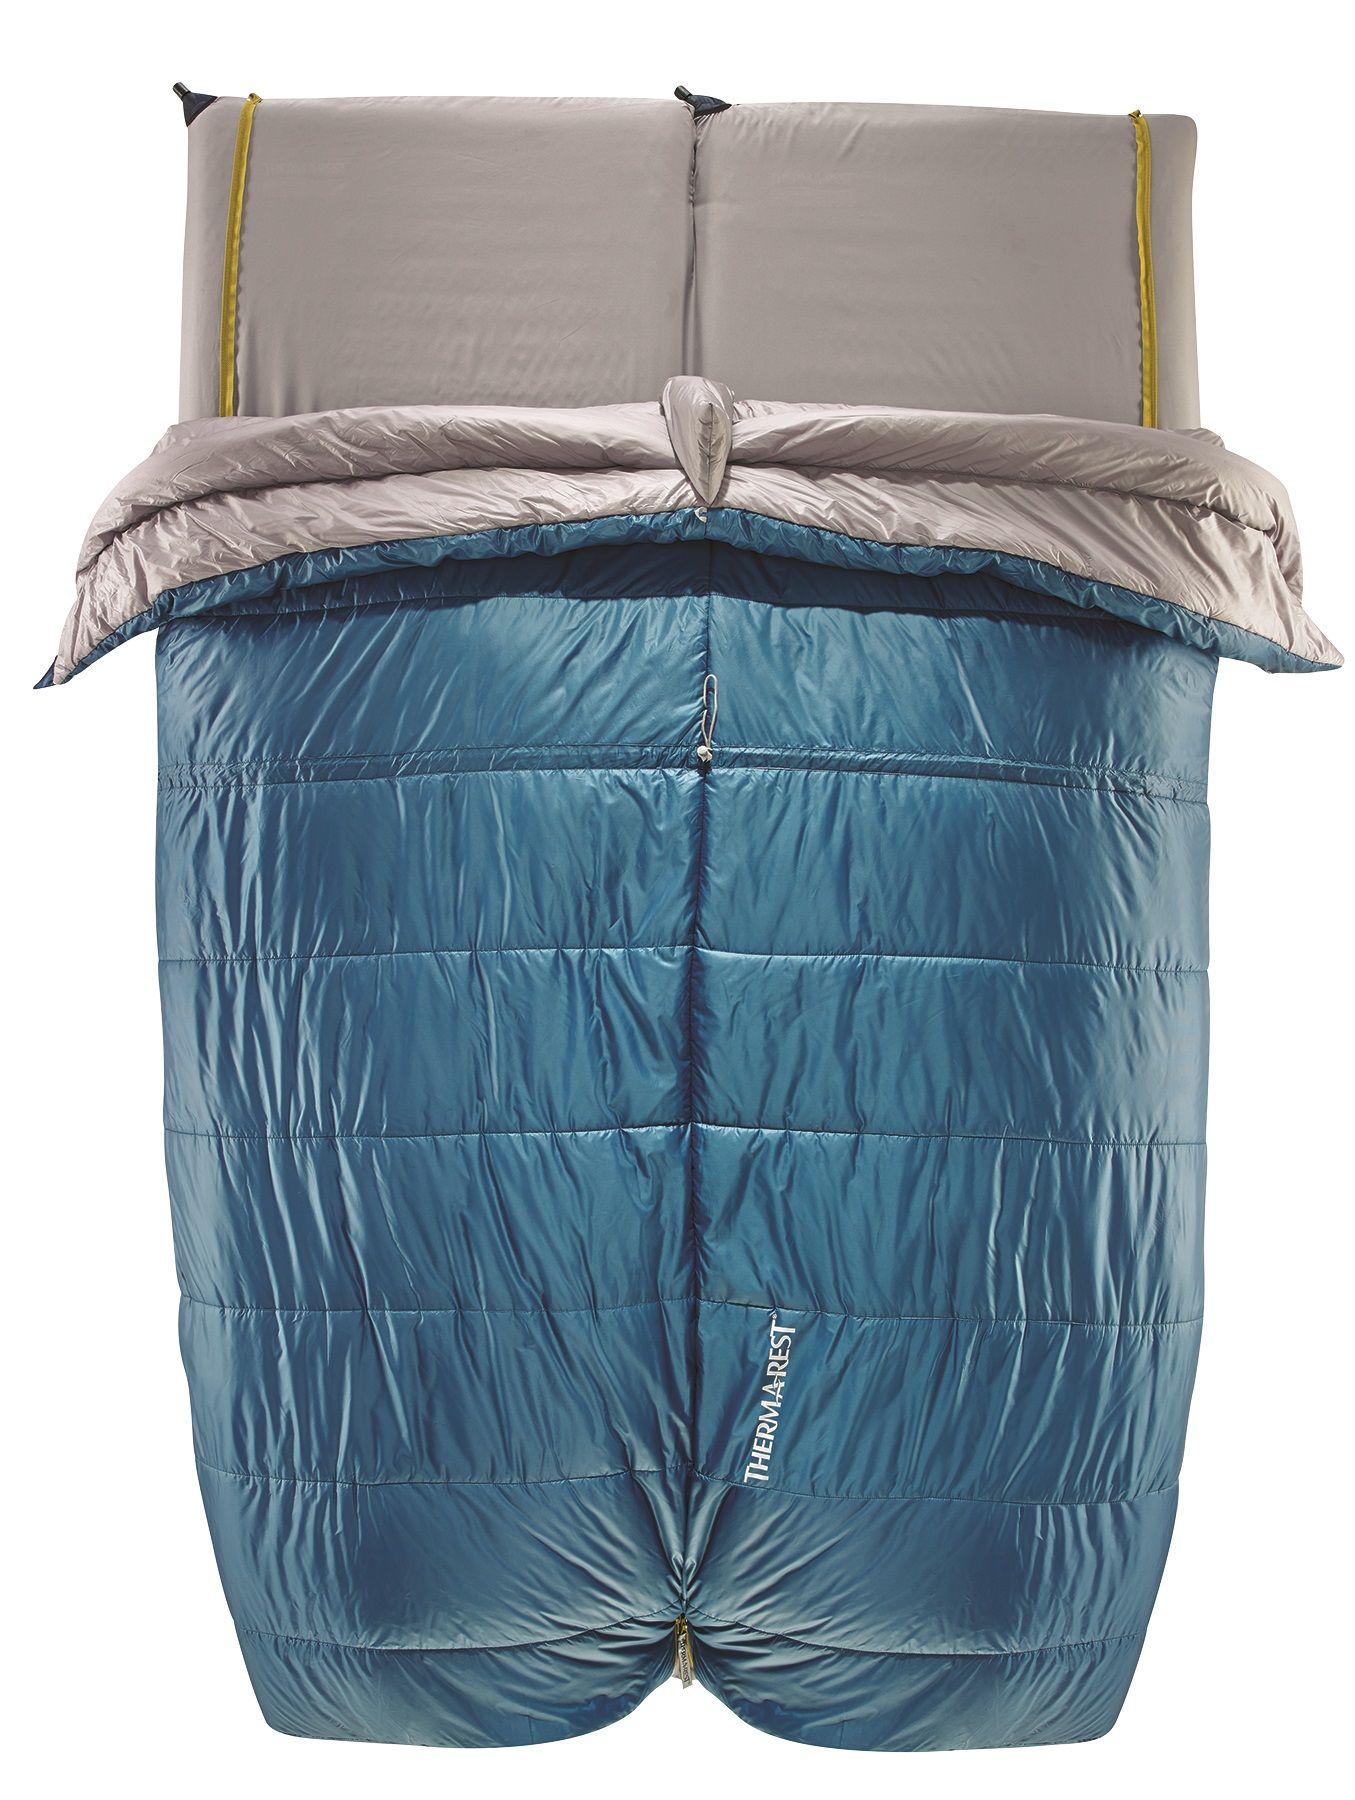 Therm-a-Rest Ventana Sleeping Bag